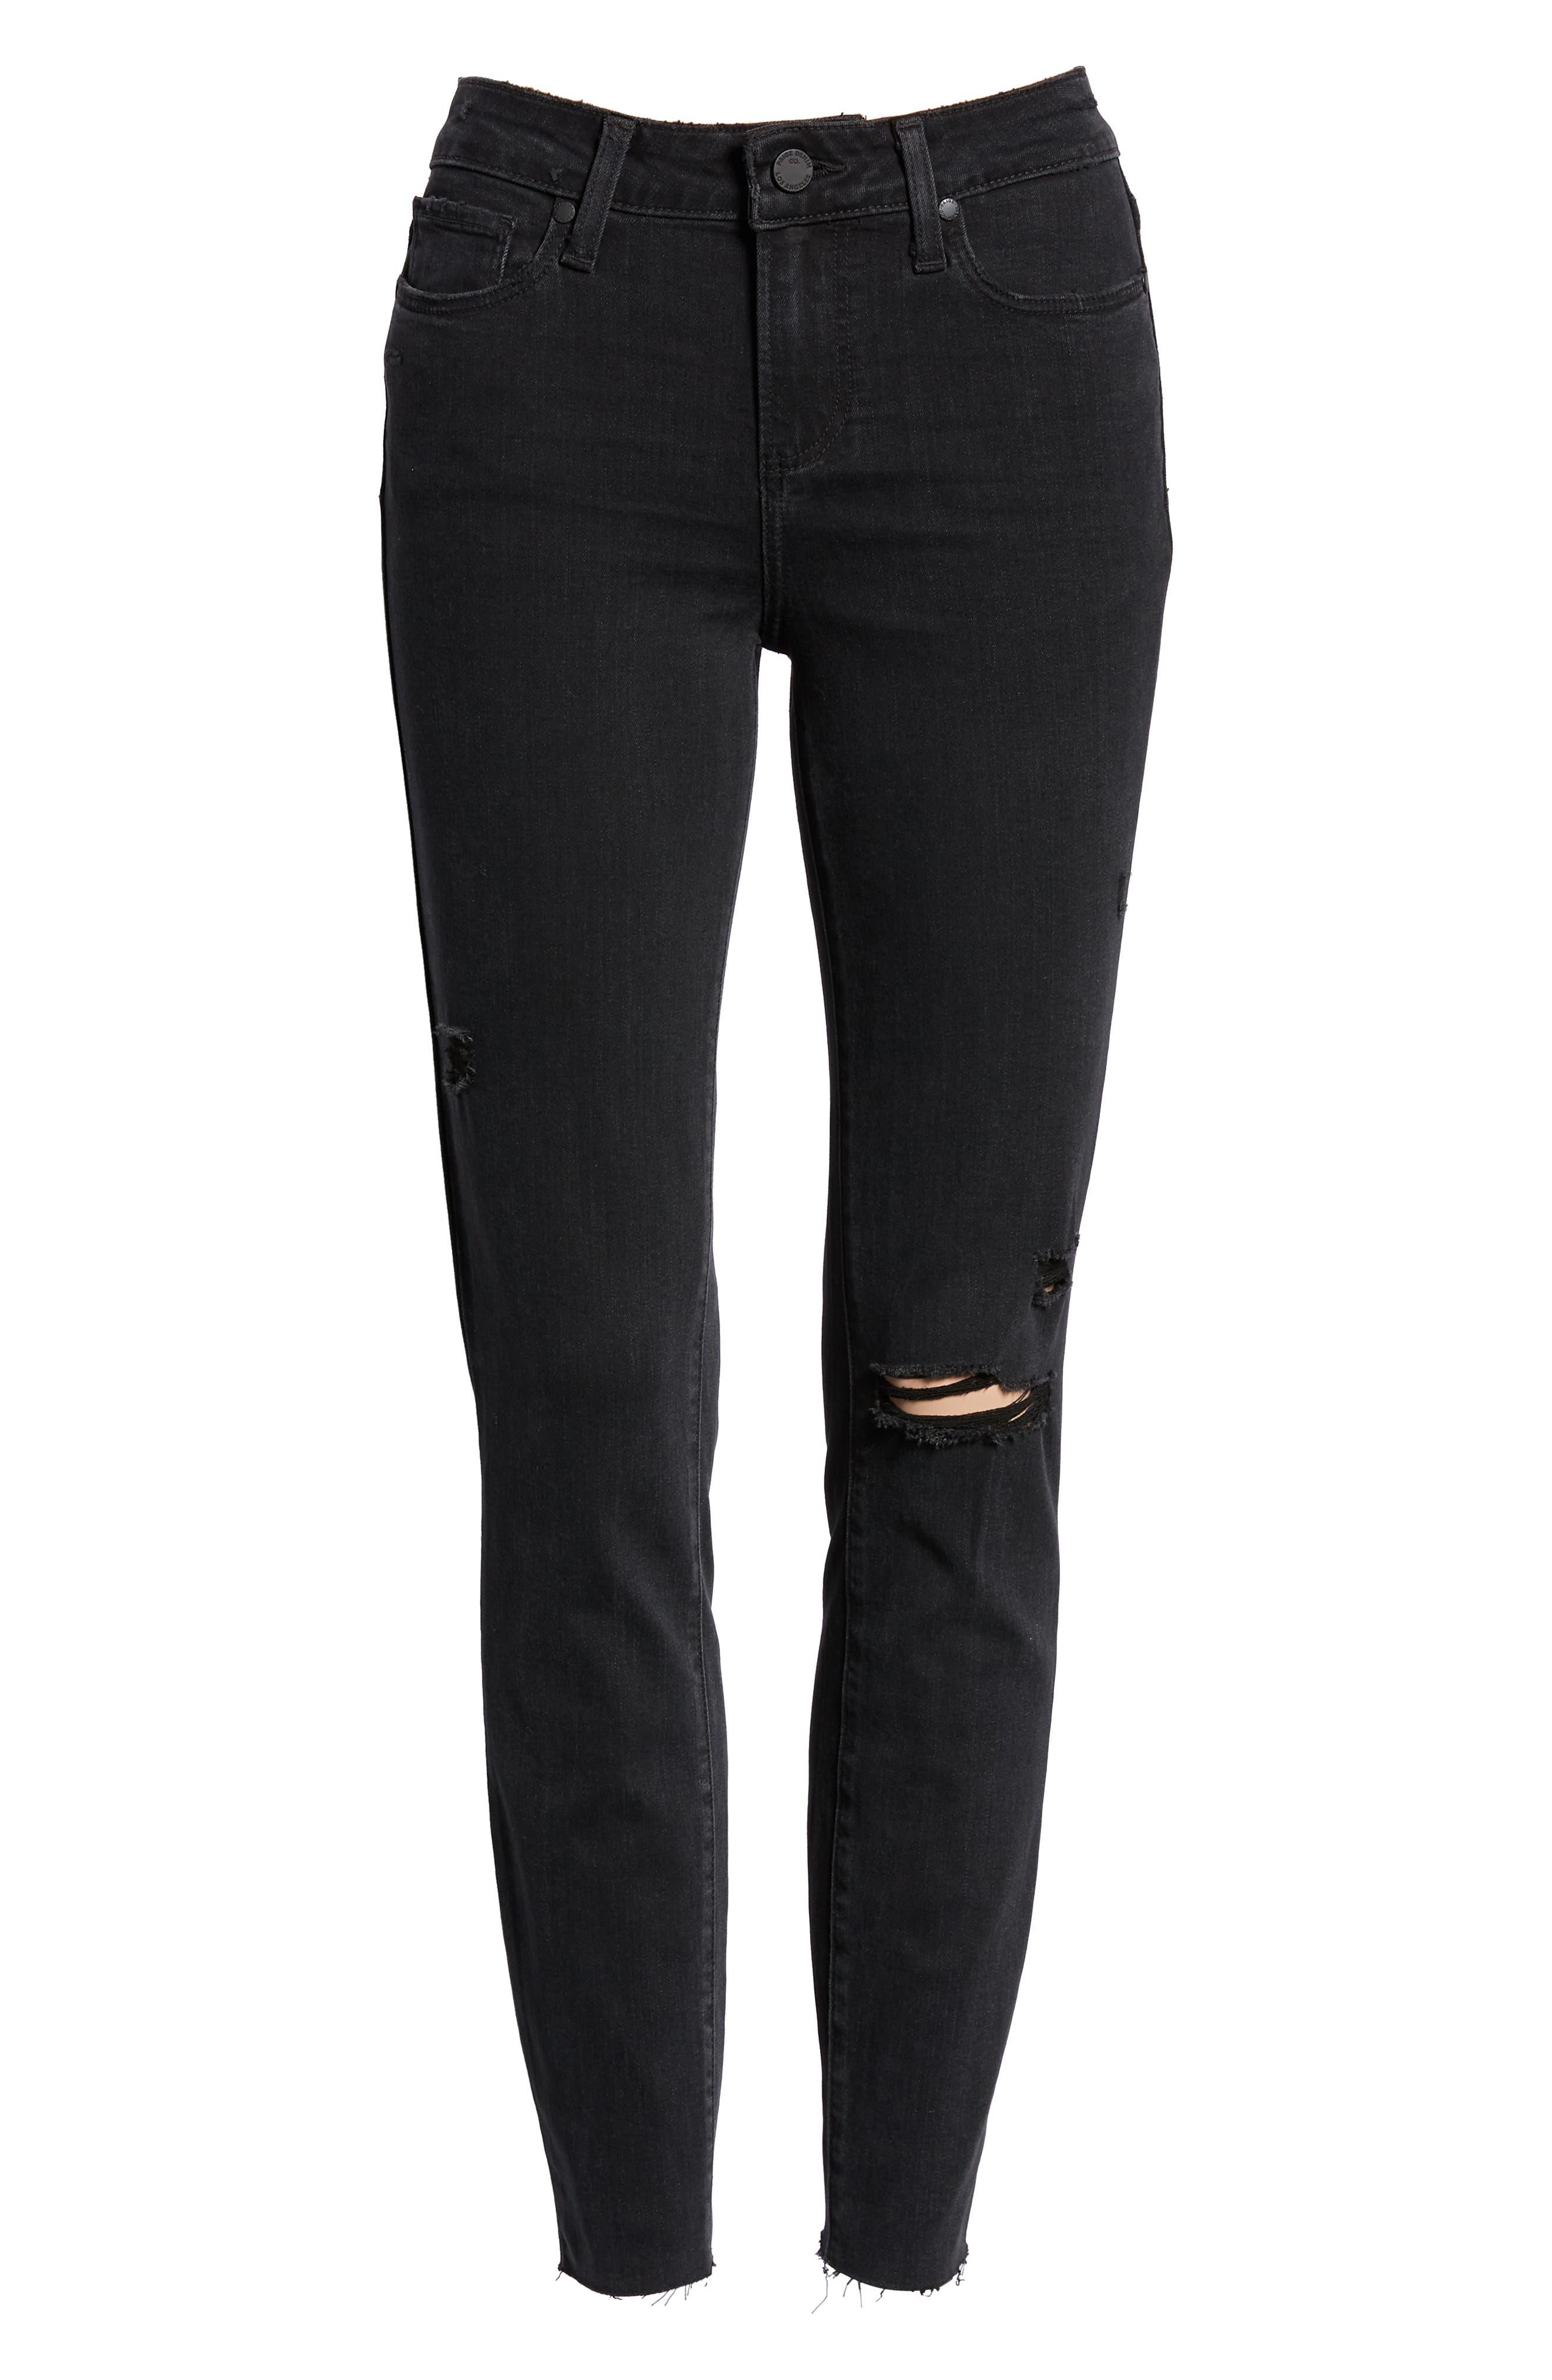 PAIGE, Transcend - Verdugo Ankle Skinny Jeans, Alternate thumbnail 7, color, 001